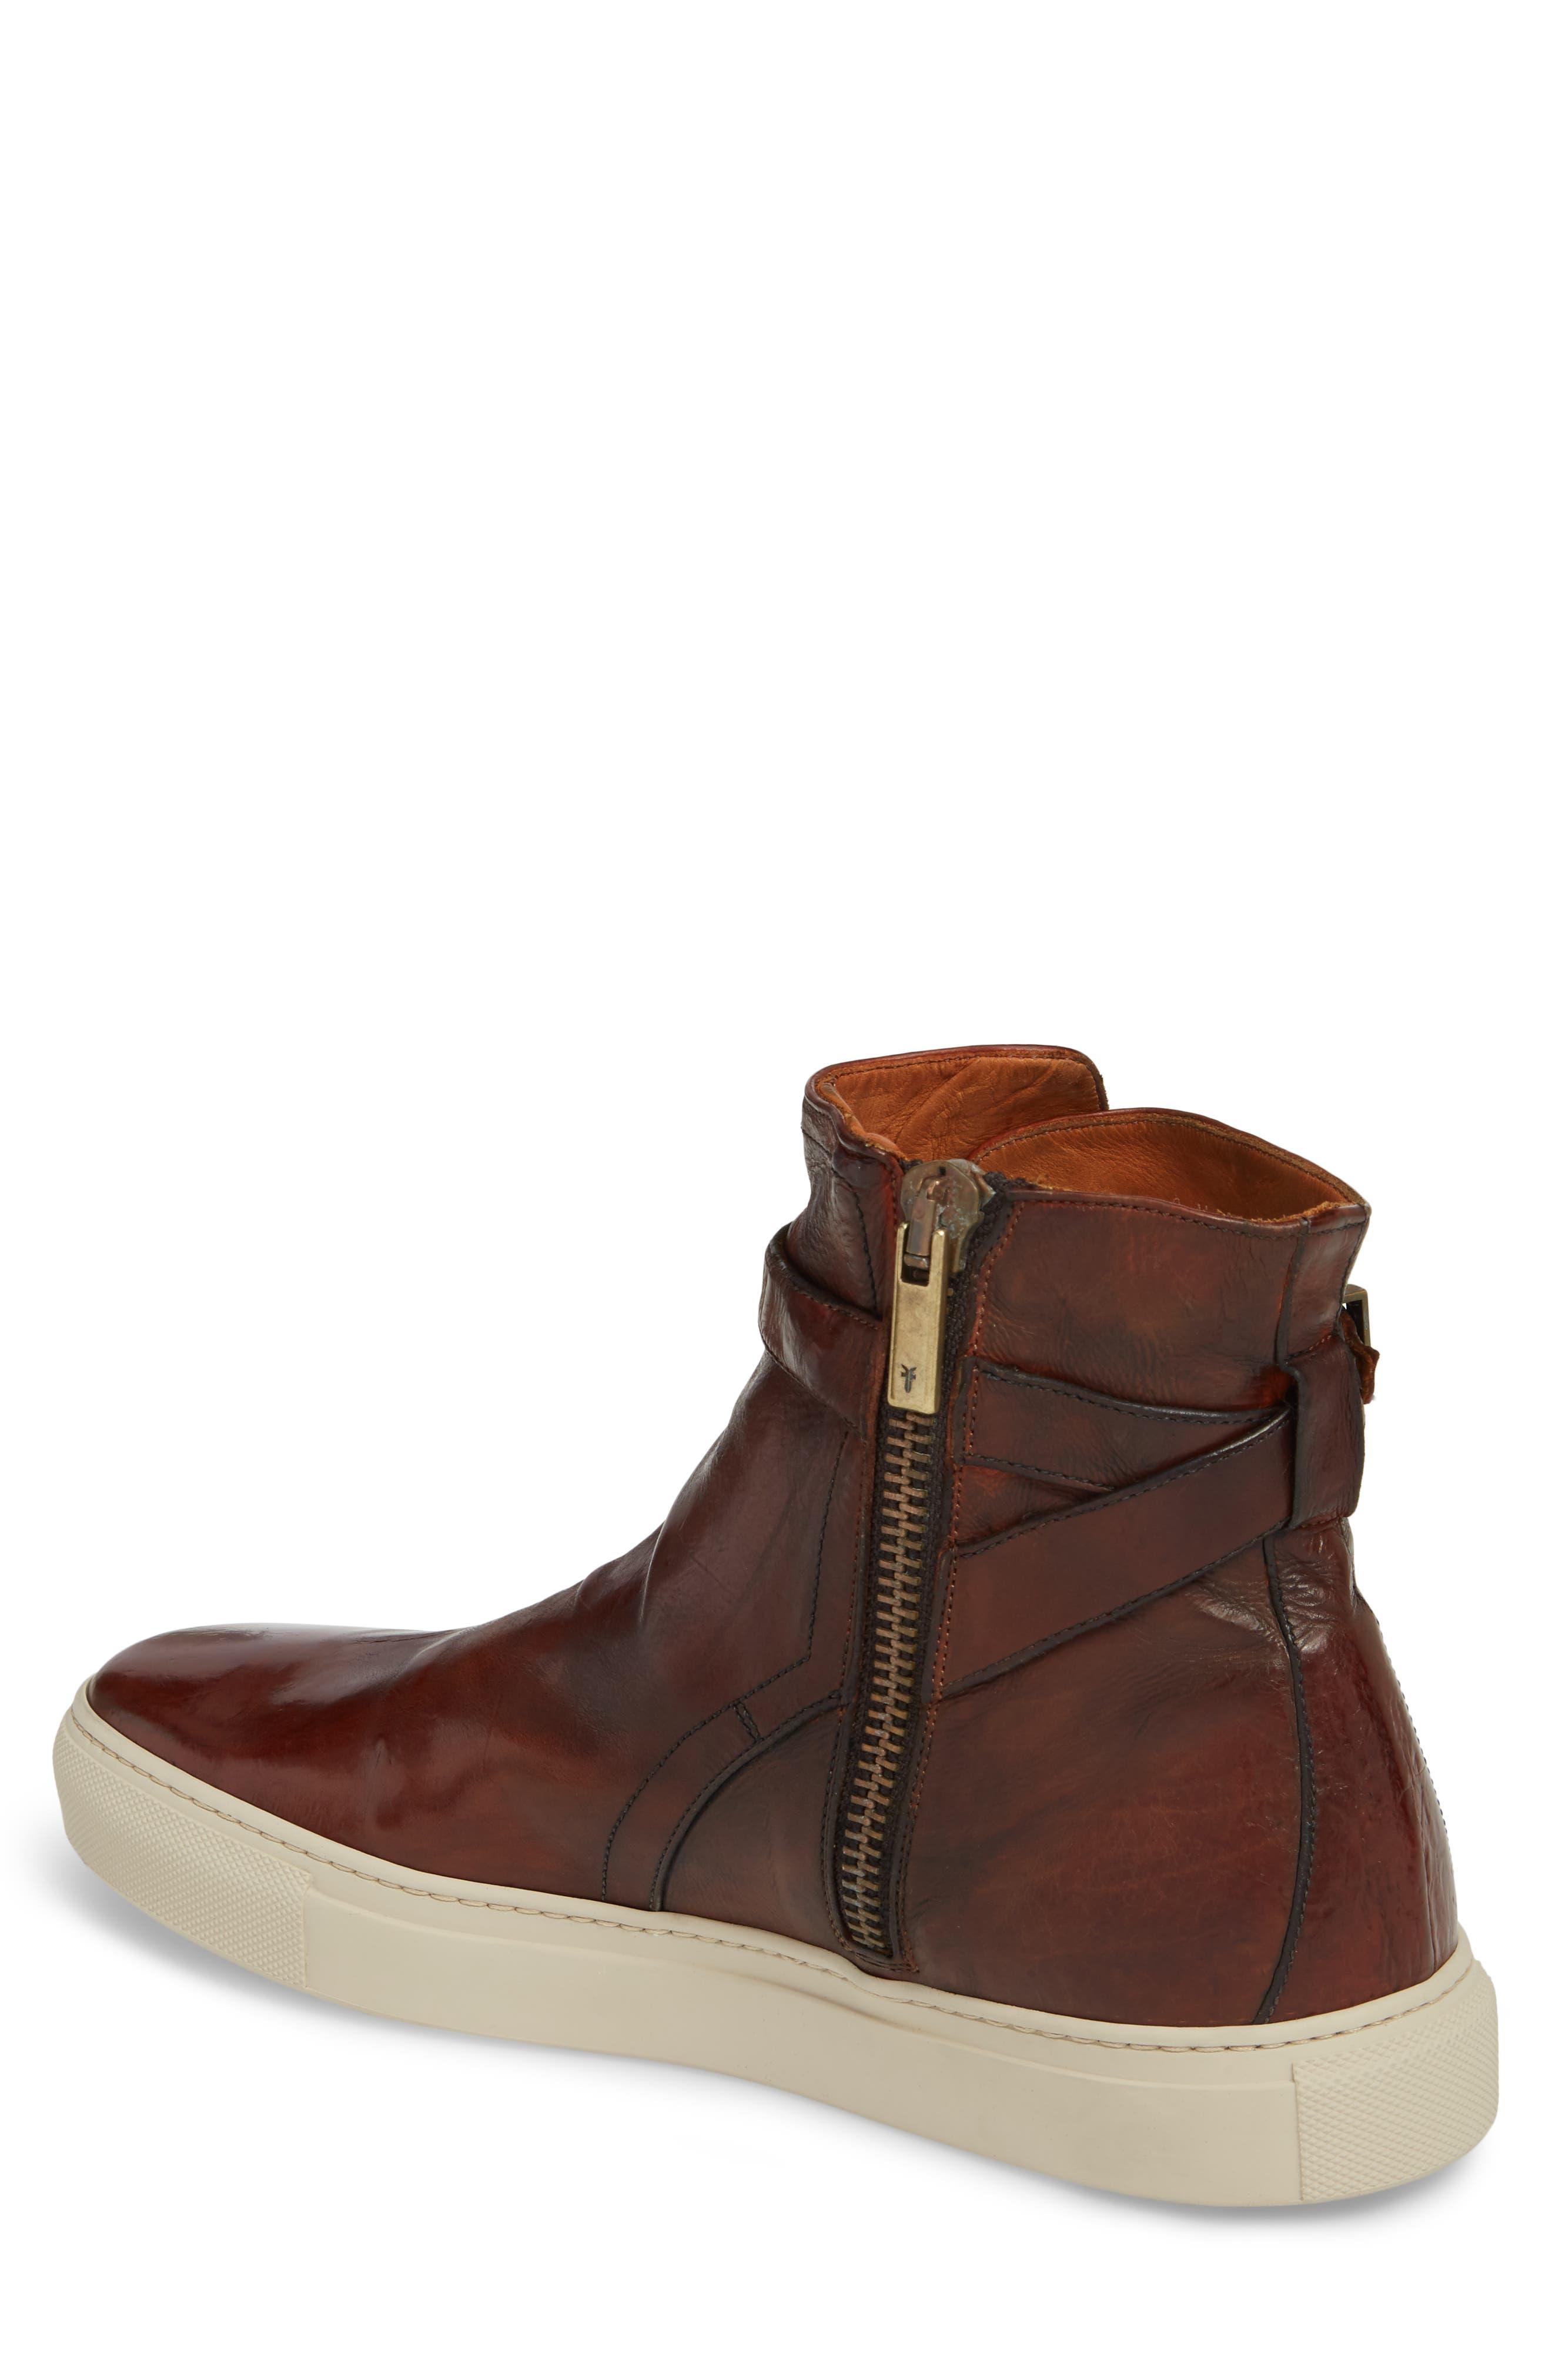 Owen Jodhpur High Top Sneaker,                             Alternate thumbnail 4, color,